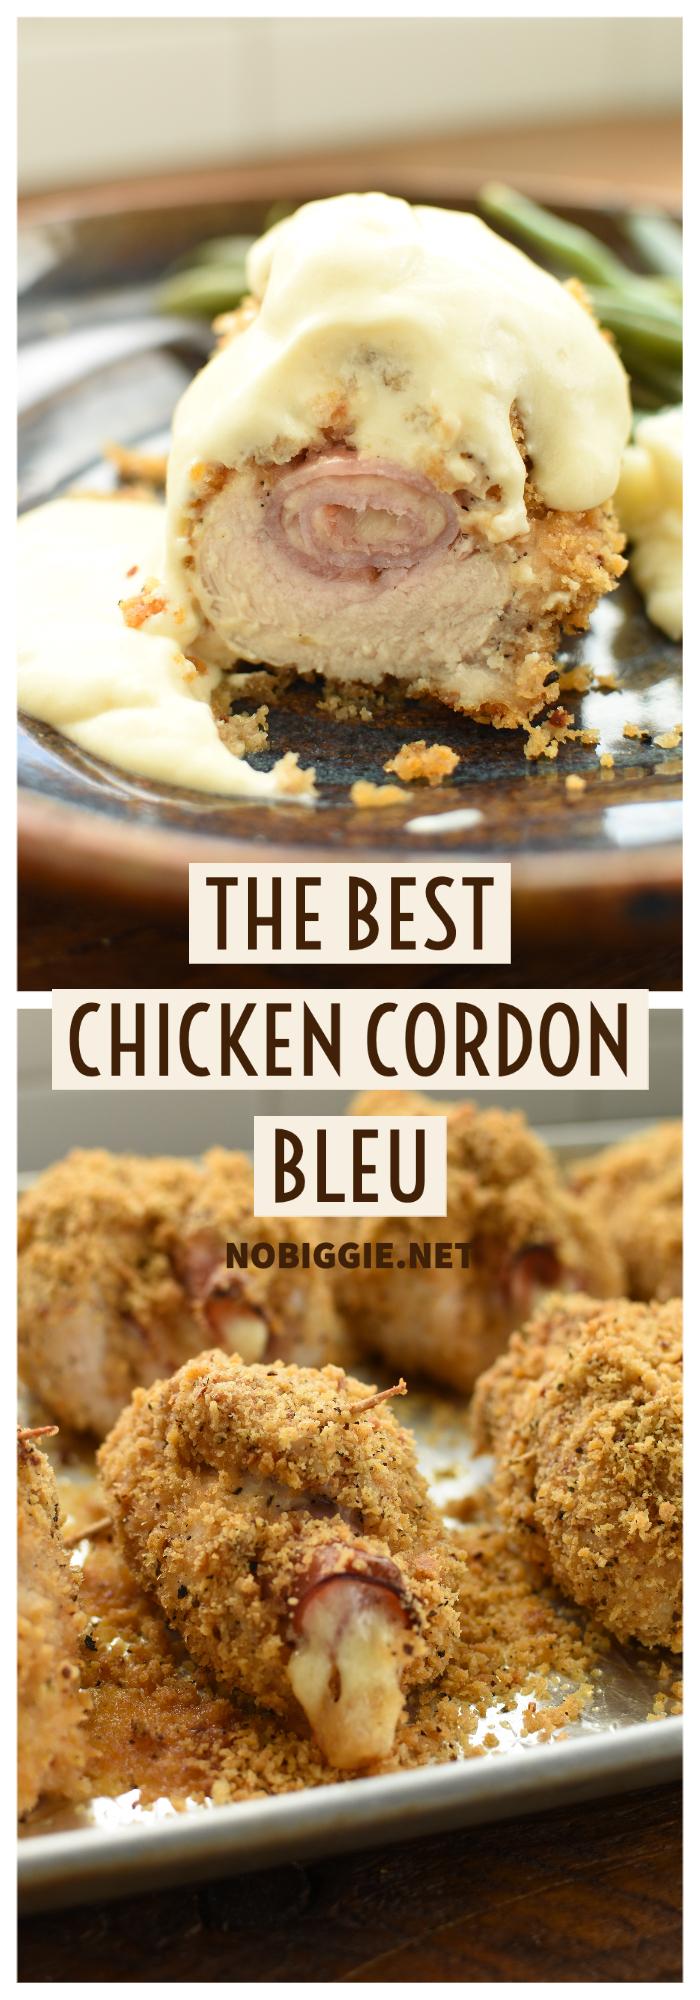 The Best Chicken Cordon Bleu | NoBiggie.net